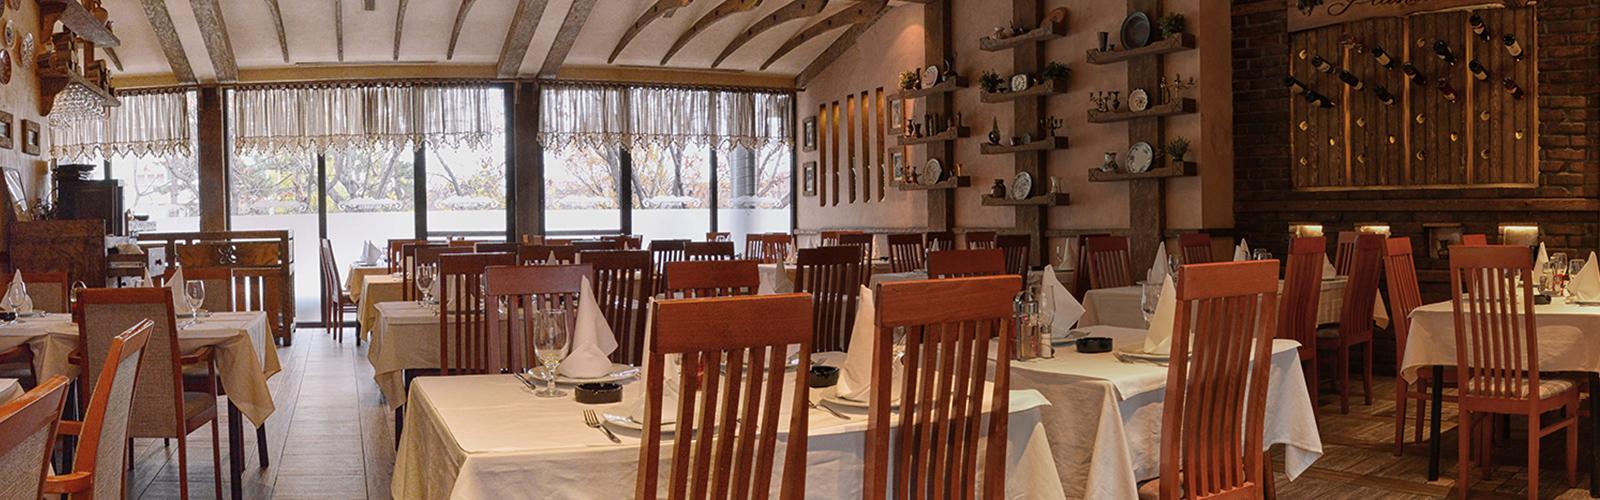 Concierge Belgrade   Restaurant Durmitor